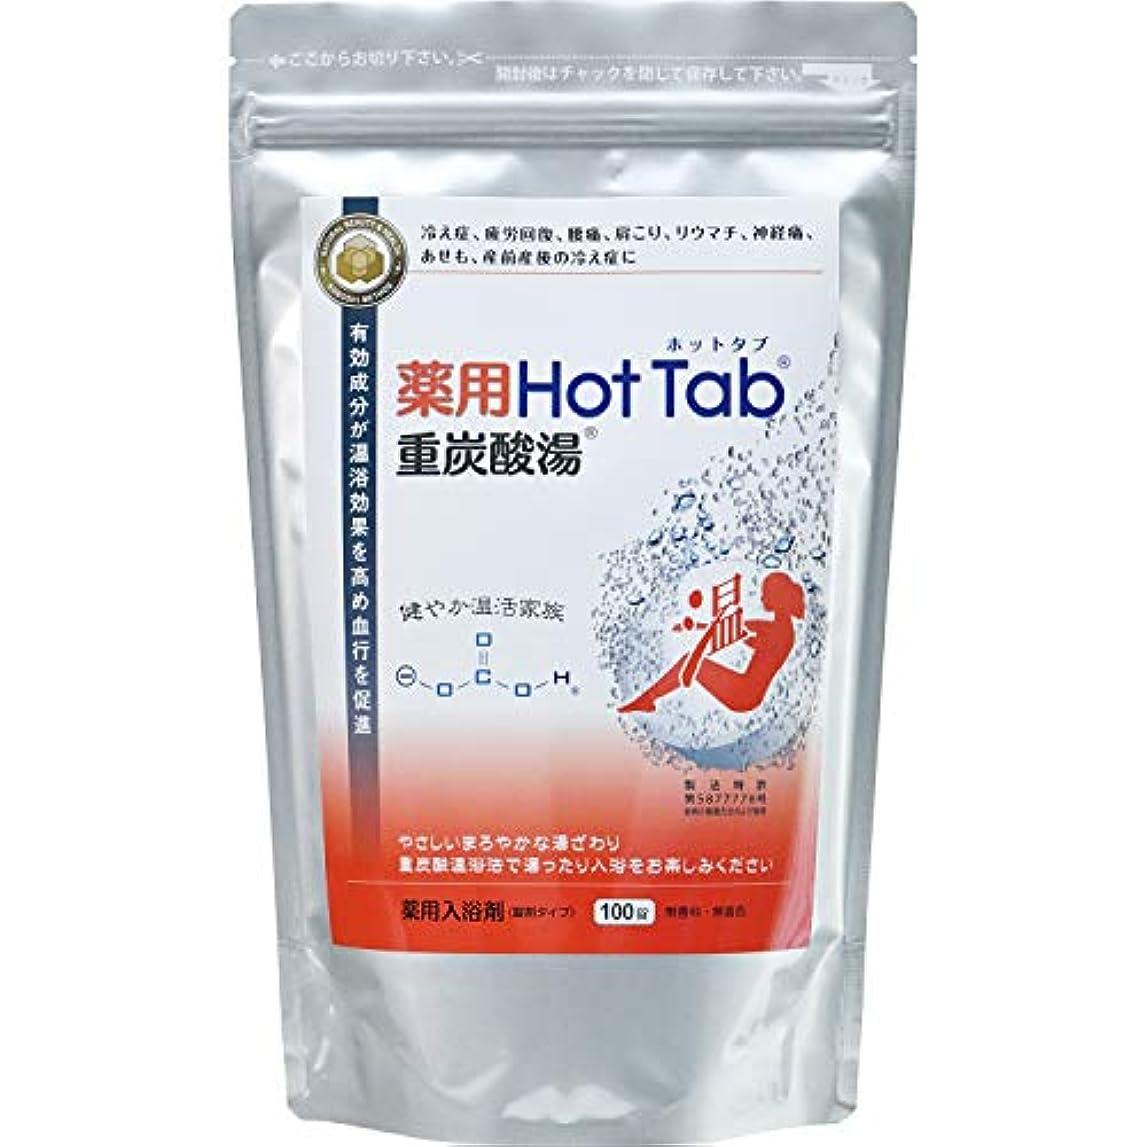 銀田舎革新ホットタブ 薬用 Hot Tab 重炭酸湯 100錠 入浴剤 (無香料 無着色 塩中和)